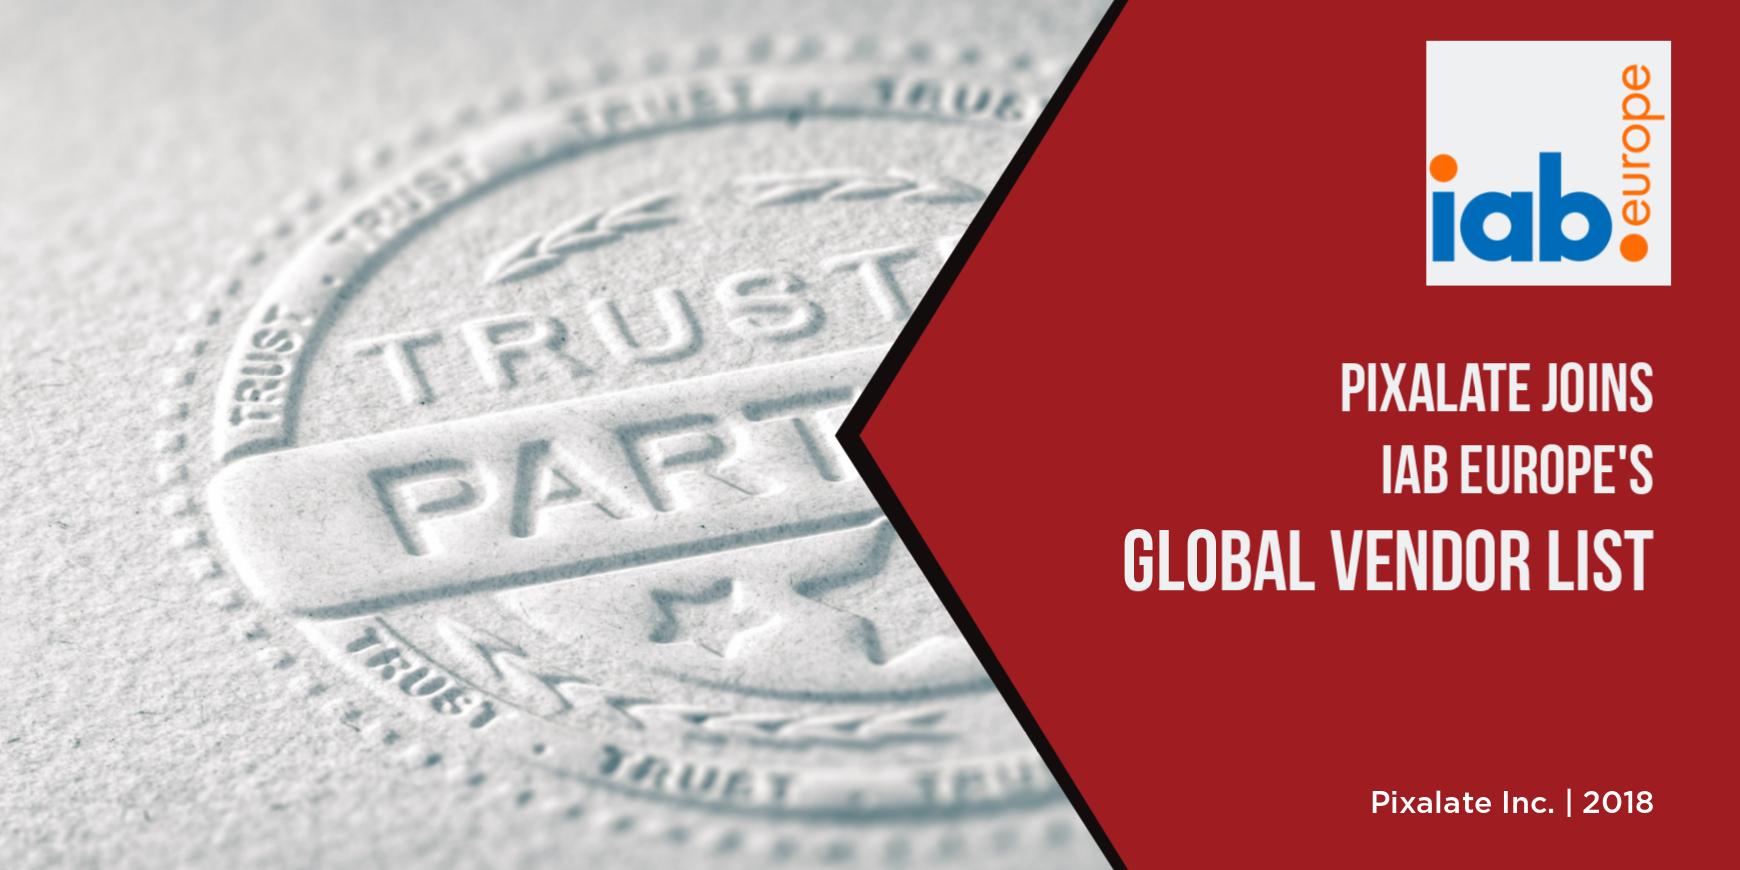 IAB-Europe-Global-Vendor-List (1)